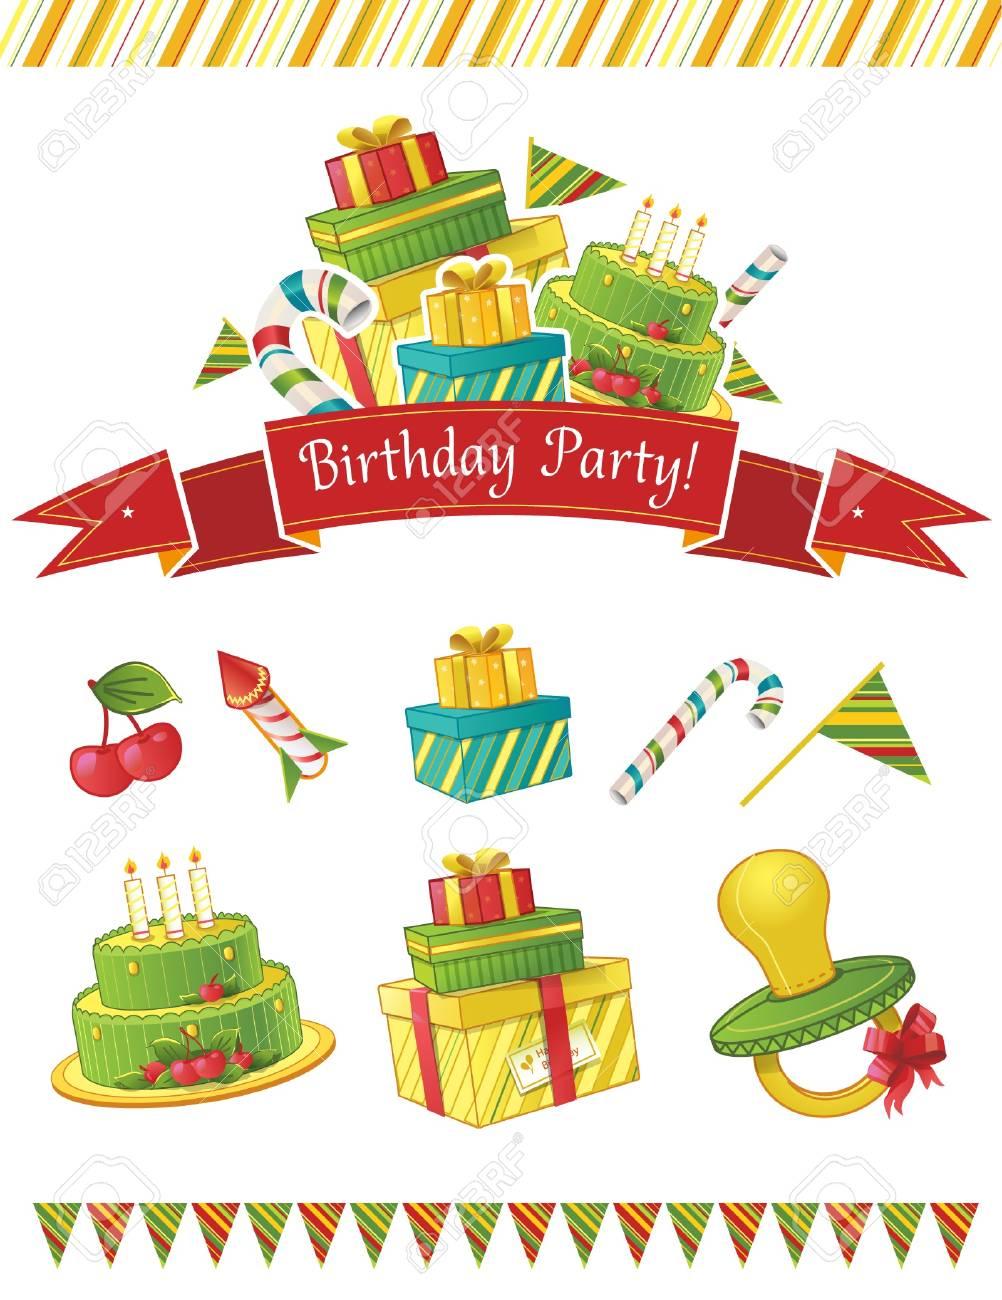 Birthday party elements Stock Vector - 15329191